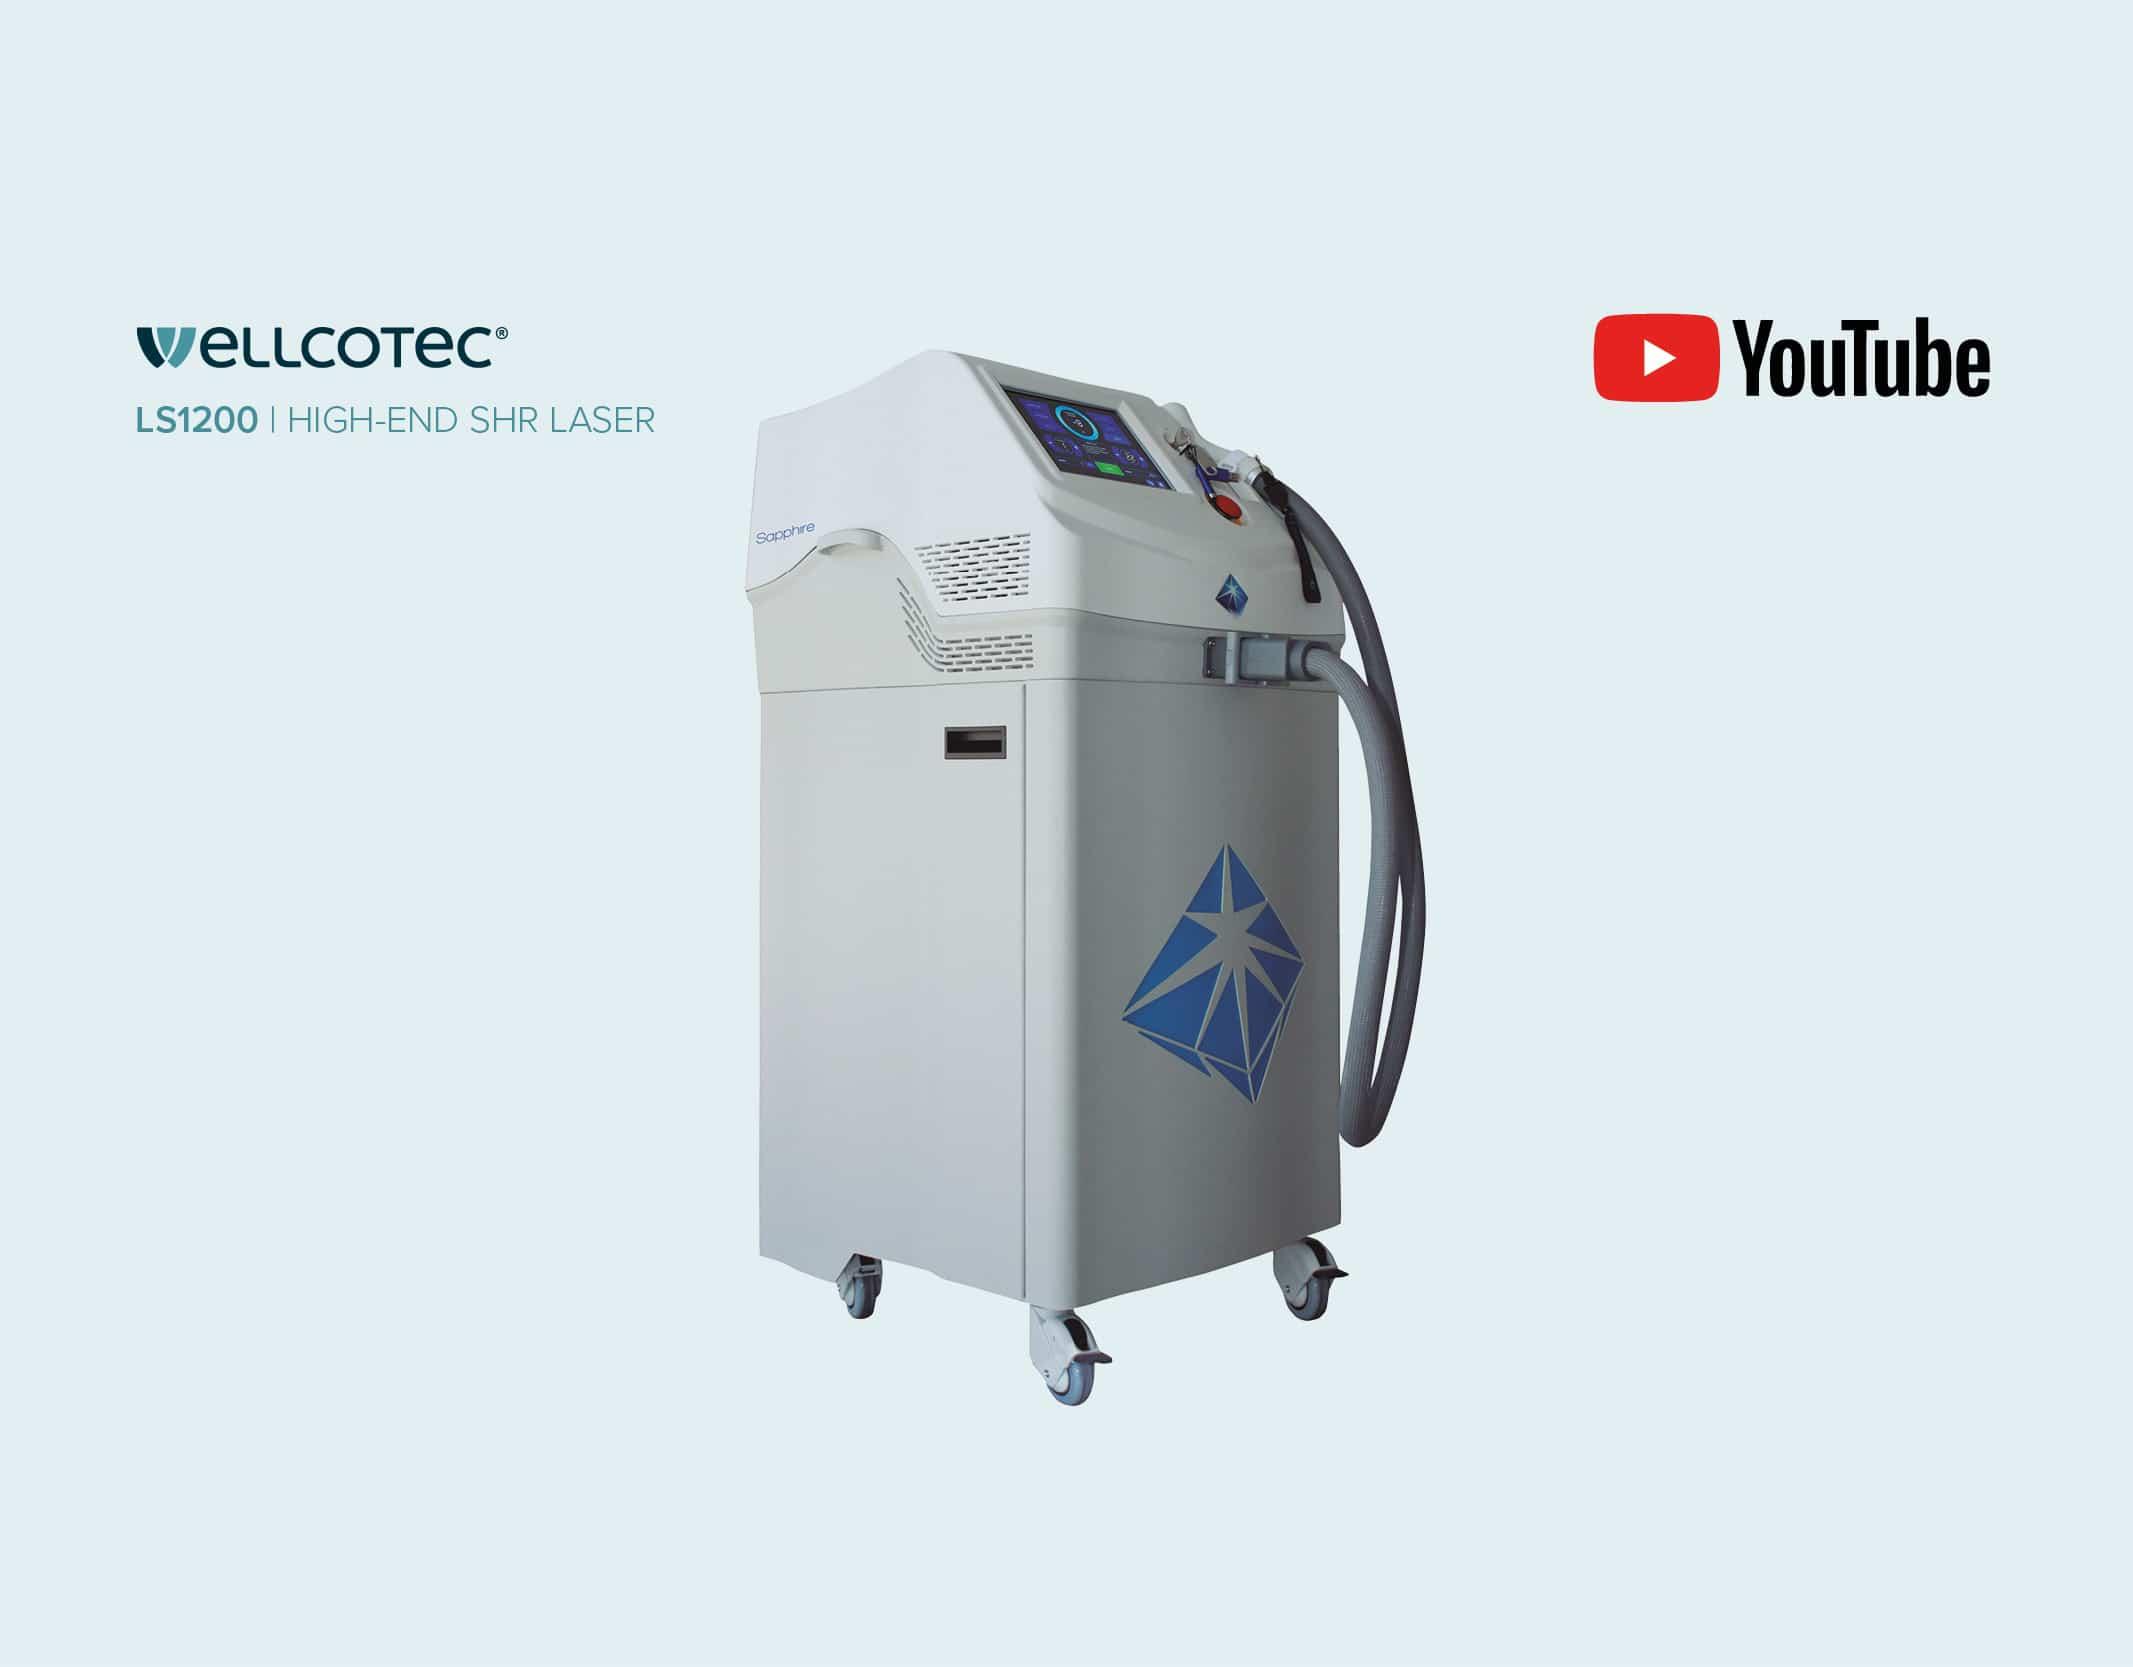 WELLCOTEC SHR Laser - Diodenlaser Haarentfernung - Dauerhafte Haarentfernung - SAPPHIRE LS1200 - Youtube Thumbnail